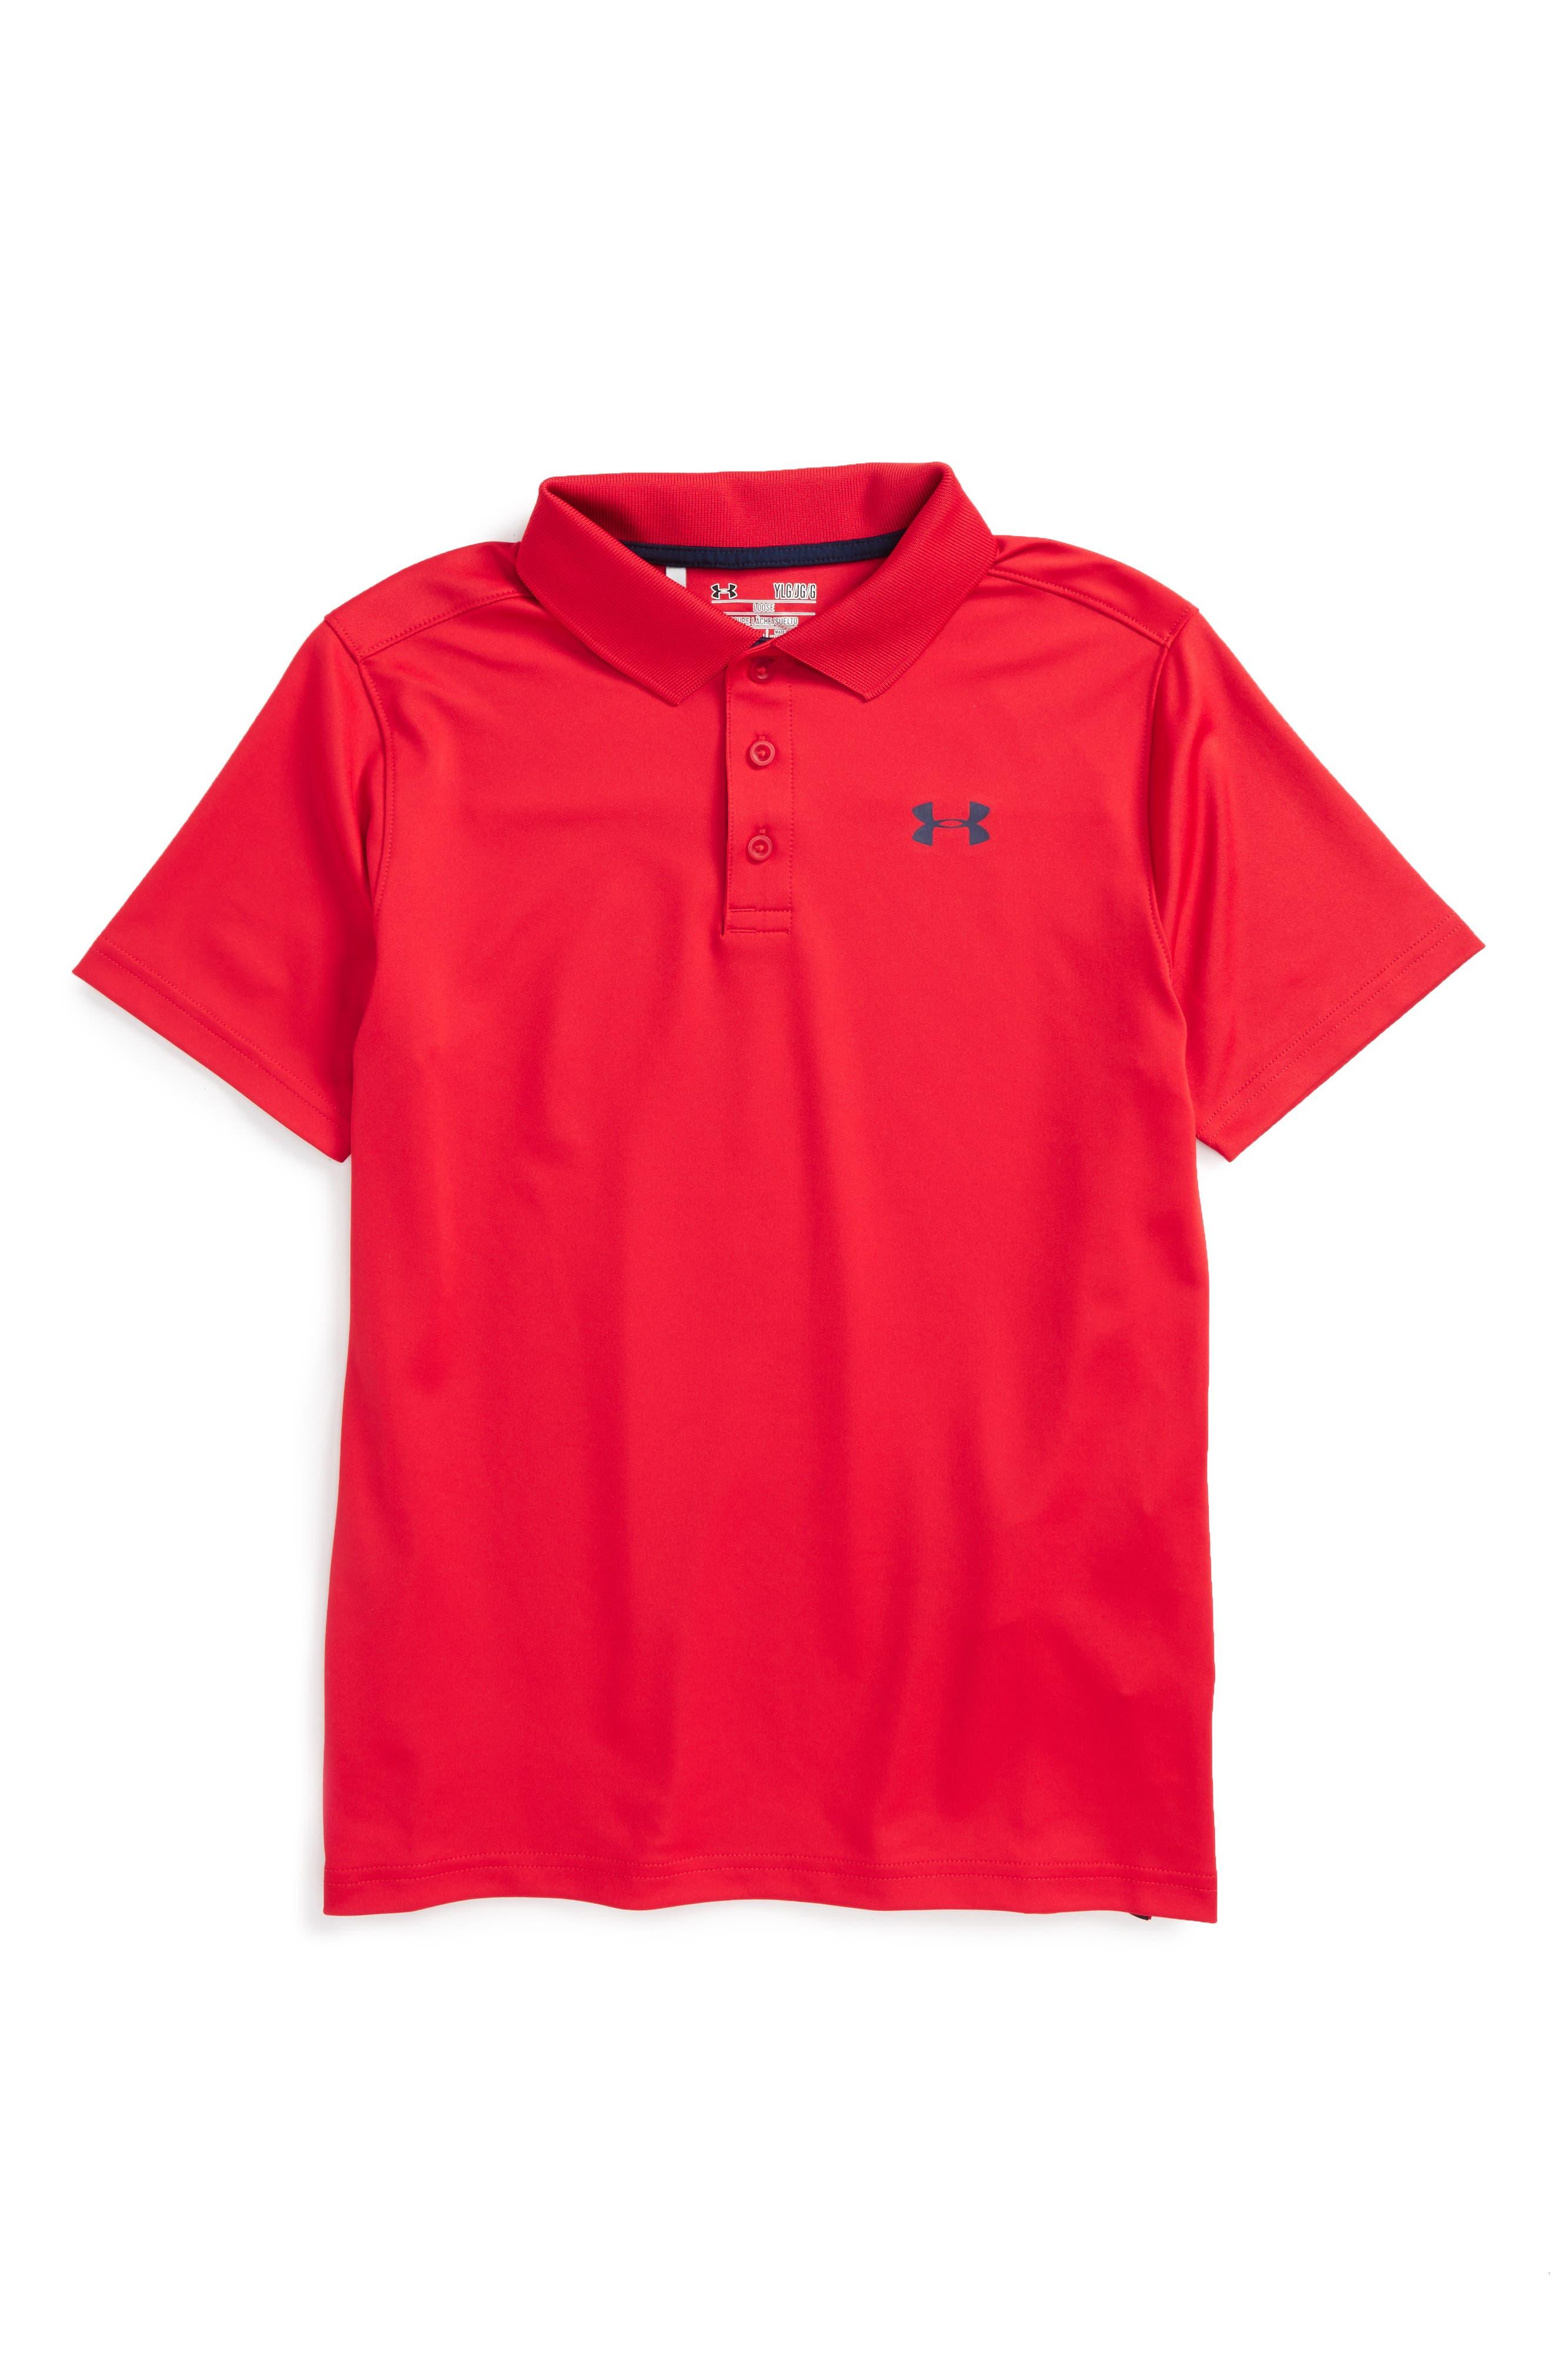 Performance HeatGear<sup>®</sup> Polo,                         Main,                         color, Red/ Academy